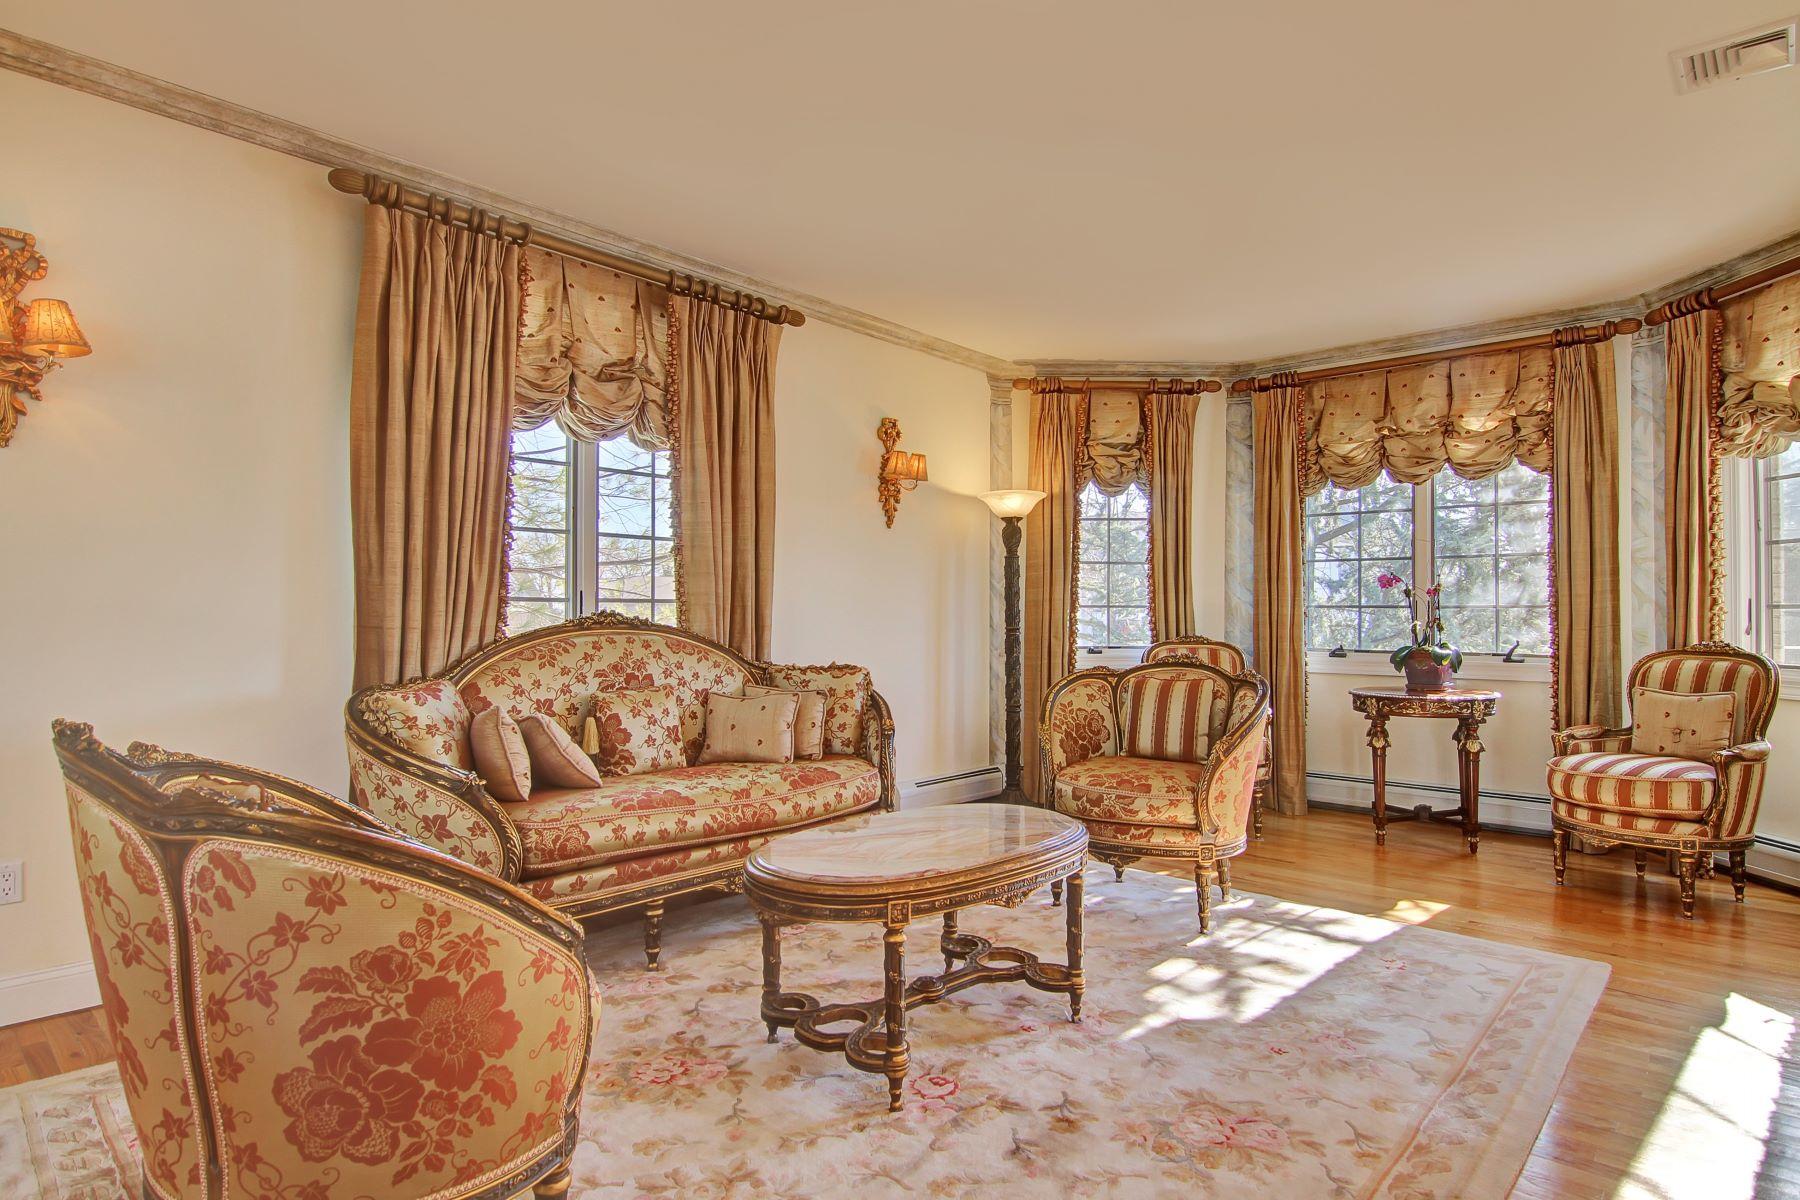 独户住宅 为 销售 在 Beautiful, custom all- brick colonial in prestigious Bluffs section! 1111 Arcadian Way 李堡, 新泽西州 07024 美国